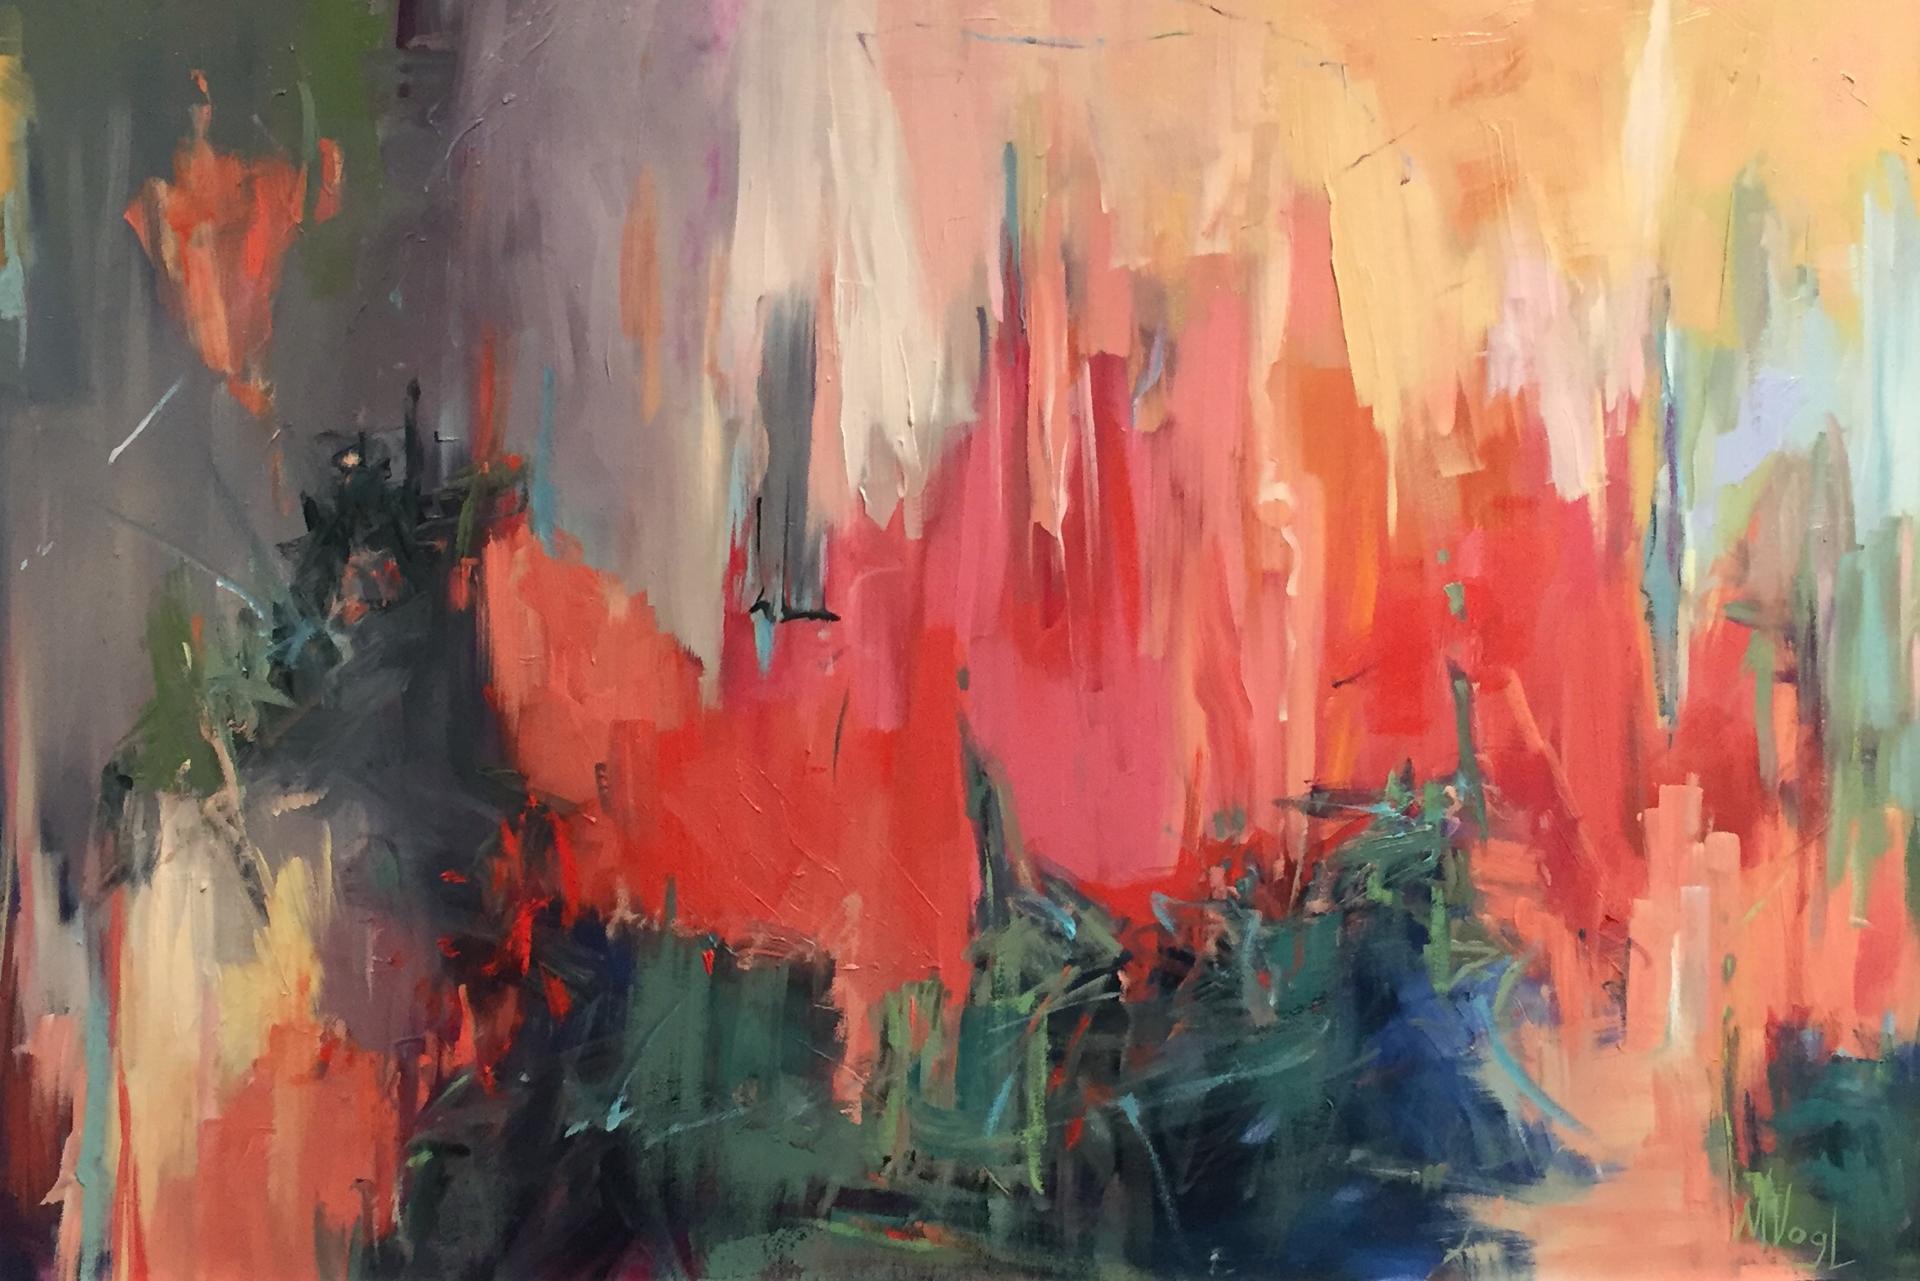 Wetlands on Fire  by Marissa Vogl